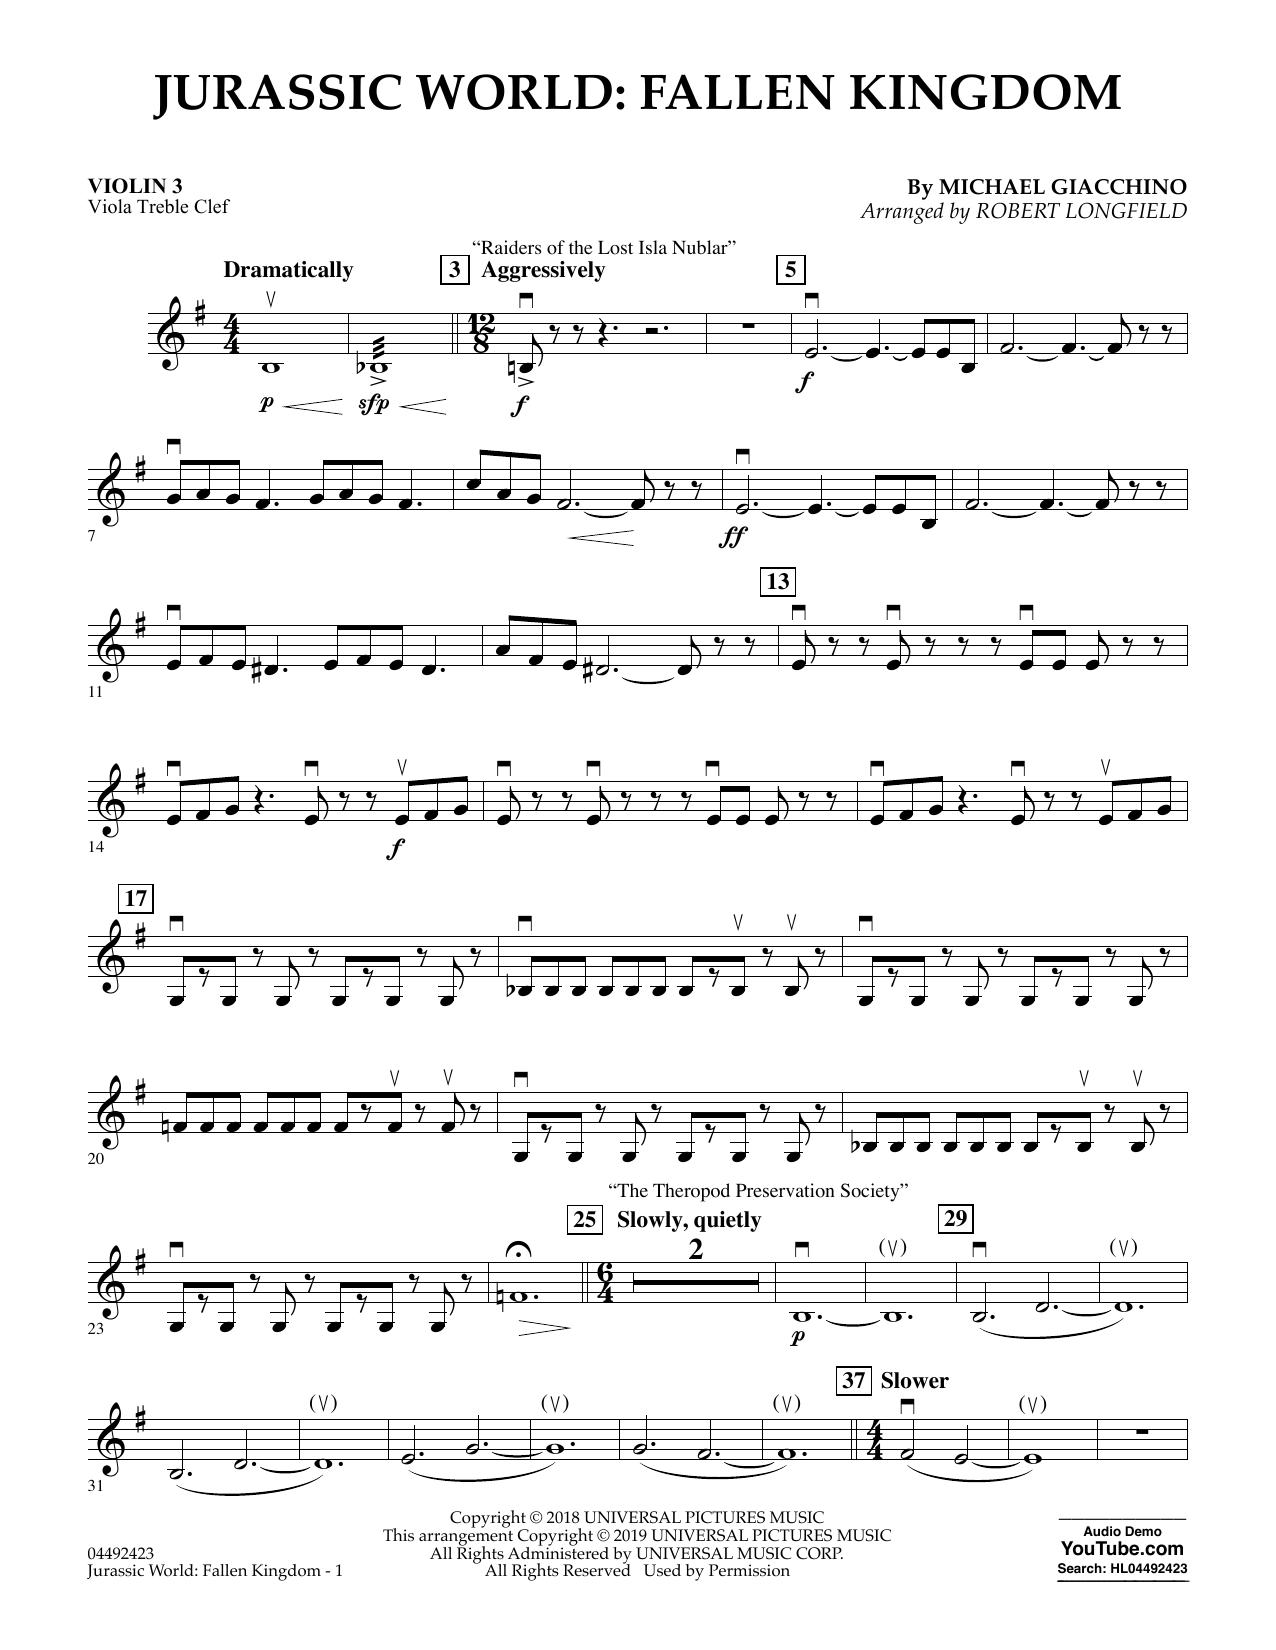 Jurassic World: Fallen Kingdom (arr. Robert Longfield) - Violin 3 (Viola Treble Clef) (Orchestra)